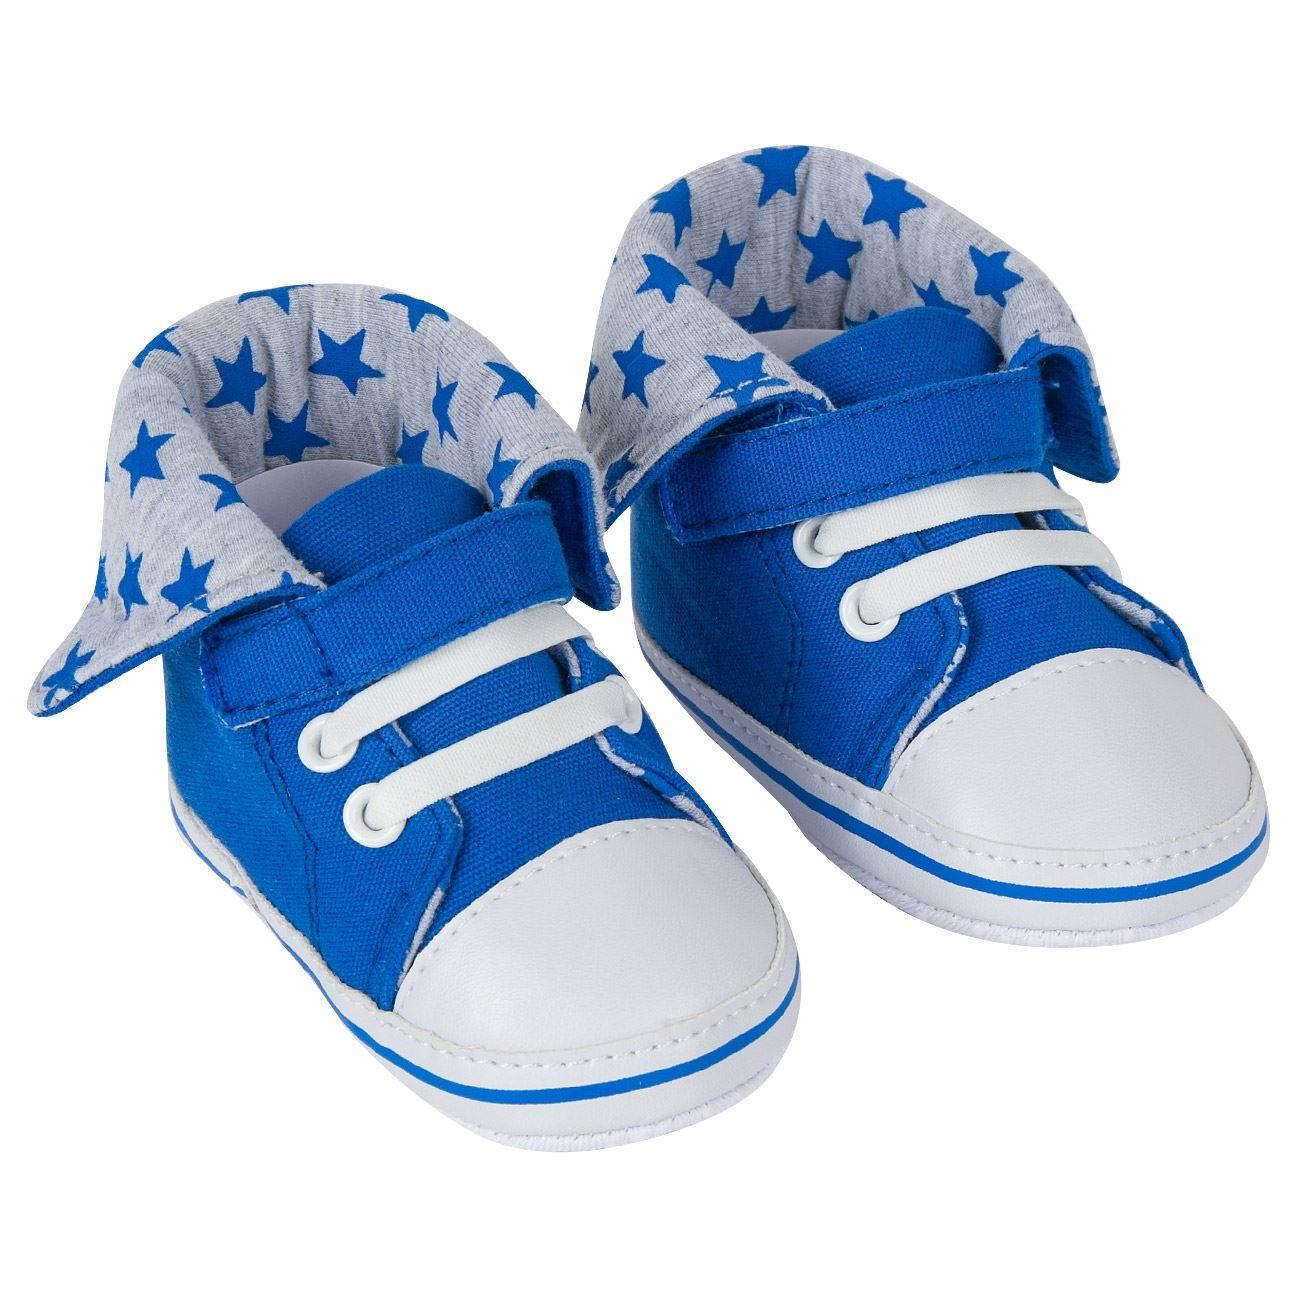 5ba89e66020 Βρεφικά Παπούτσια Αθλητικά